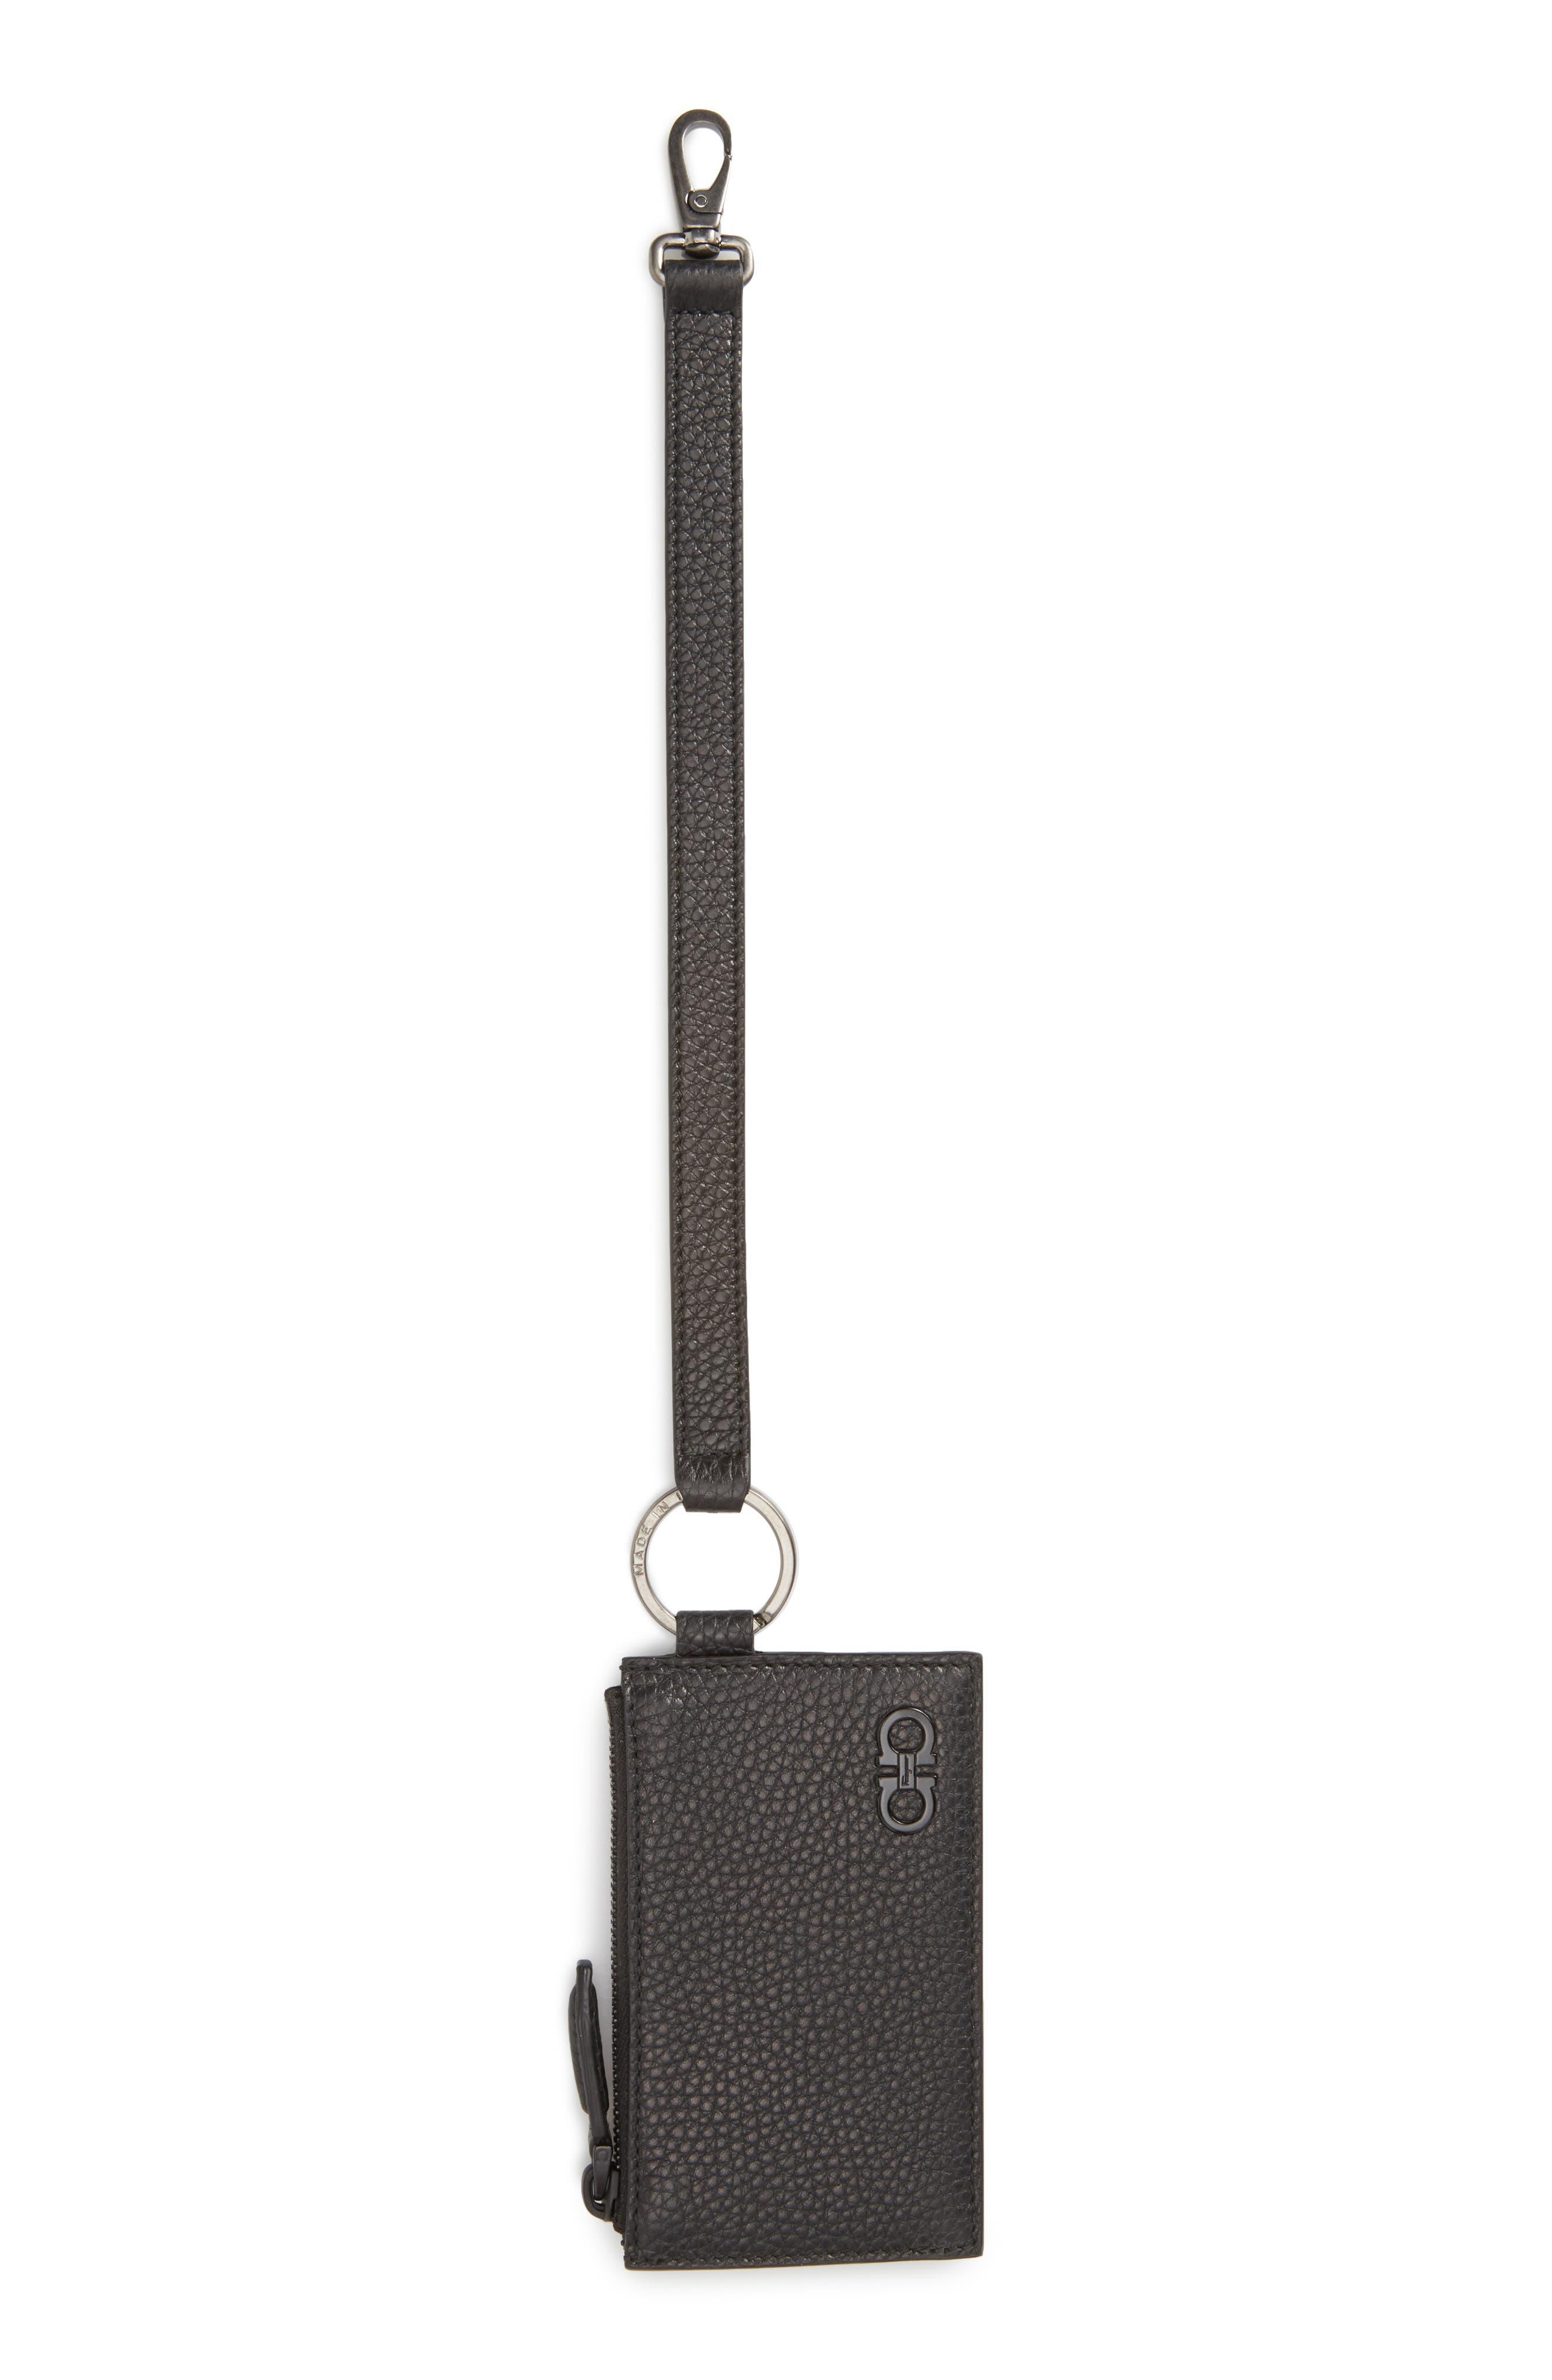 Salvatore Ferragamo Leather Zip Wallet with Strap